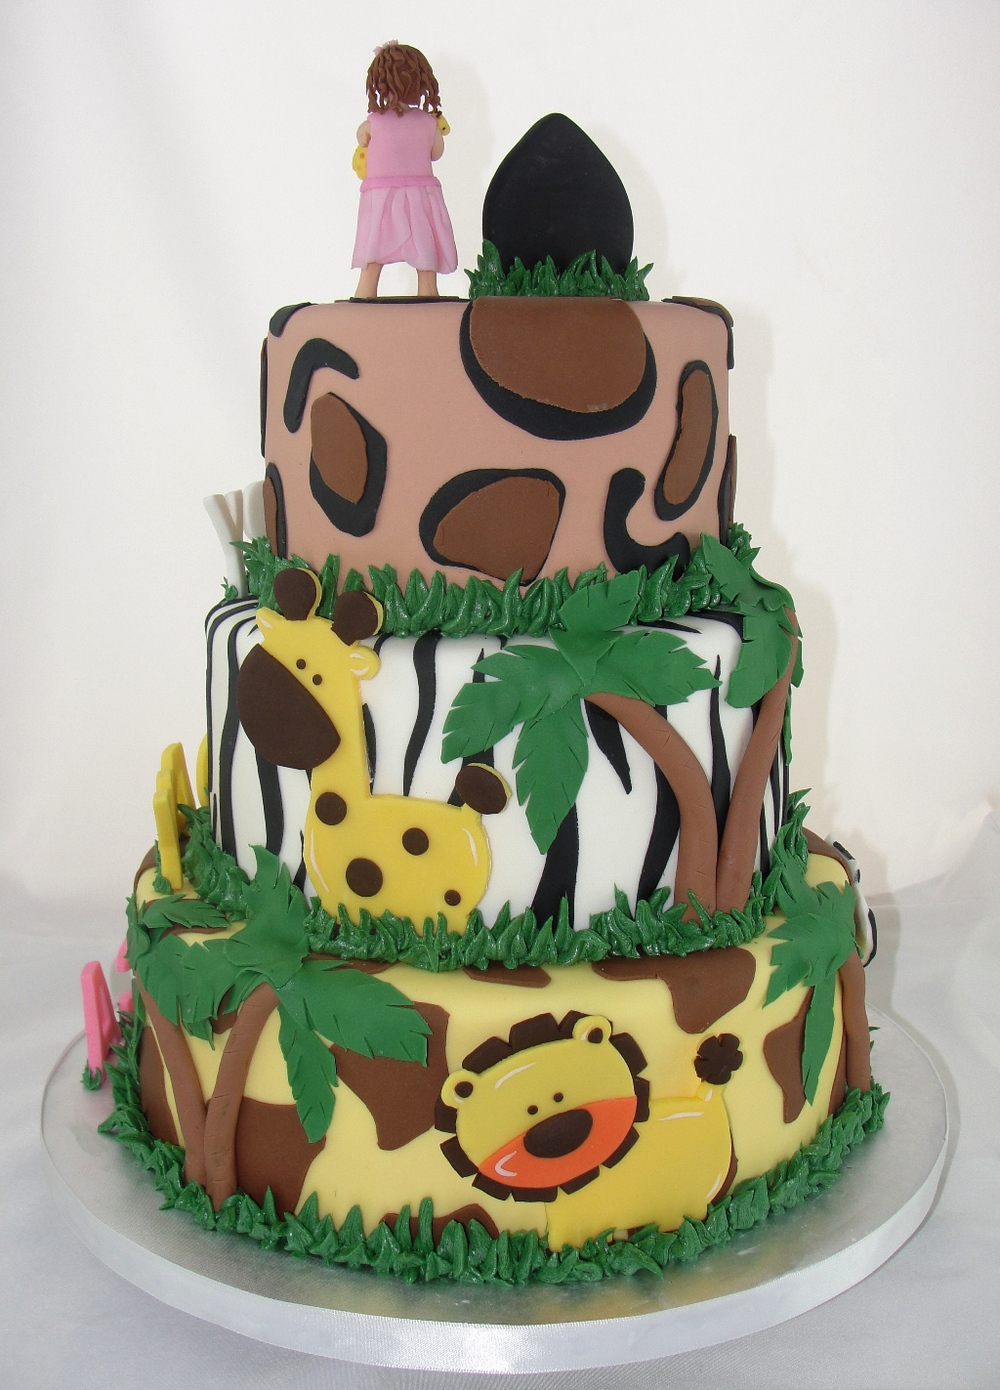 LBC 1403 - Jungle Cake 3.jpg